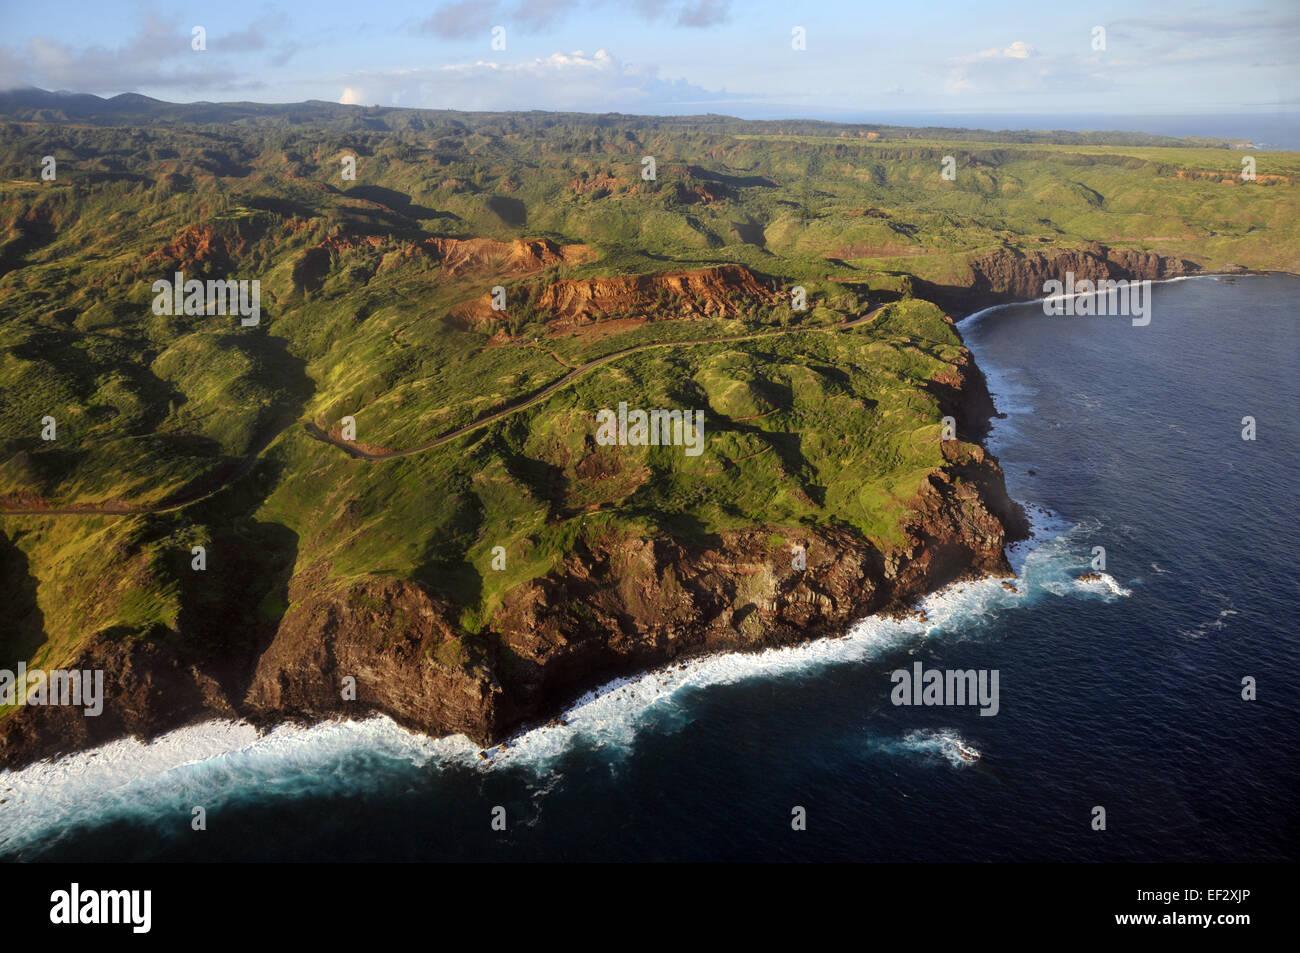 Aerial view of Maui, Hawaii Stock Photo